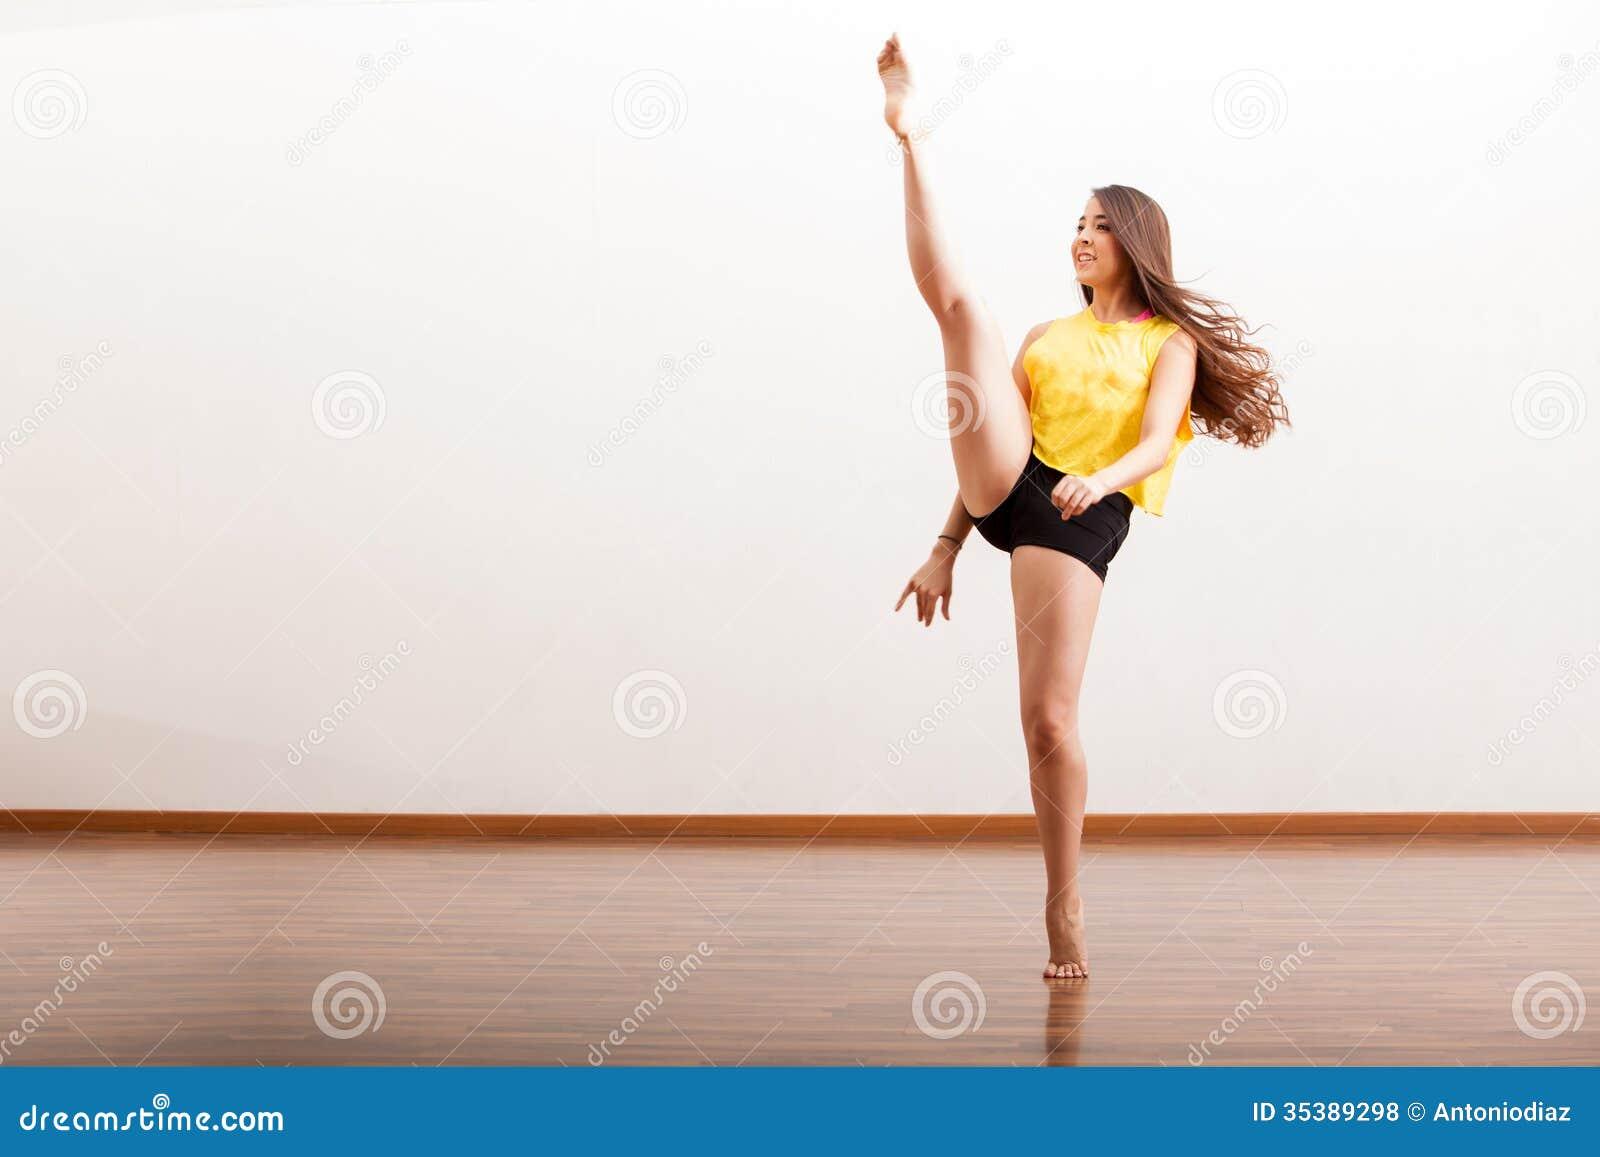 Royalty Free Stock Photos Jazz Dancer Performing Routine Beautiful Young Raising Her Leg Dance Performance Dance Academy Image35389298 on Dance Studio Floor Plans